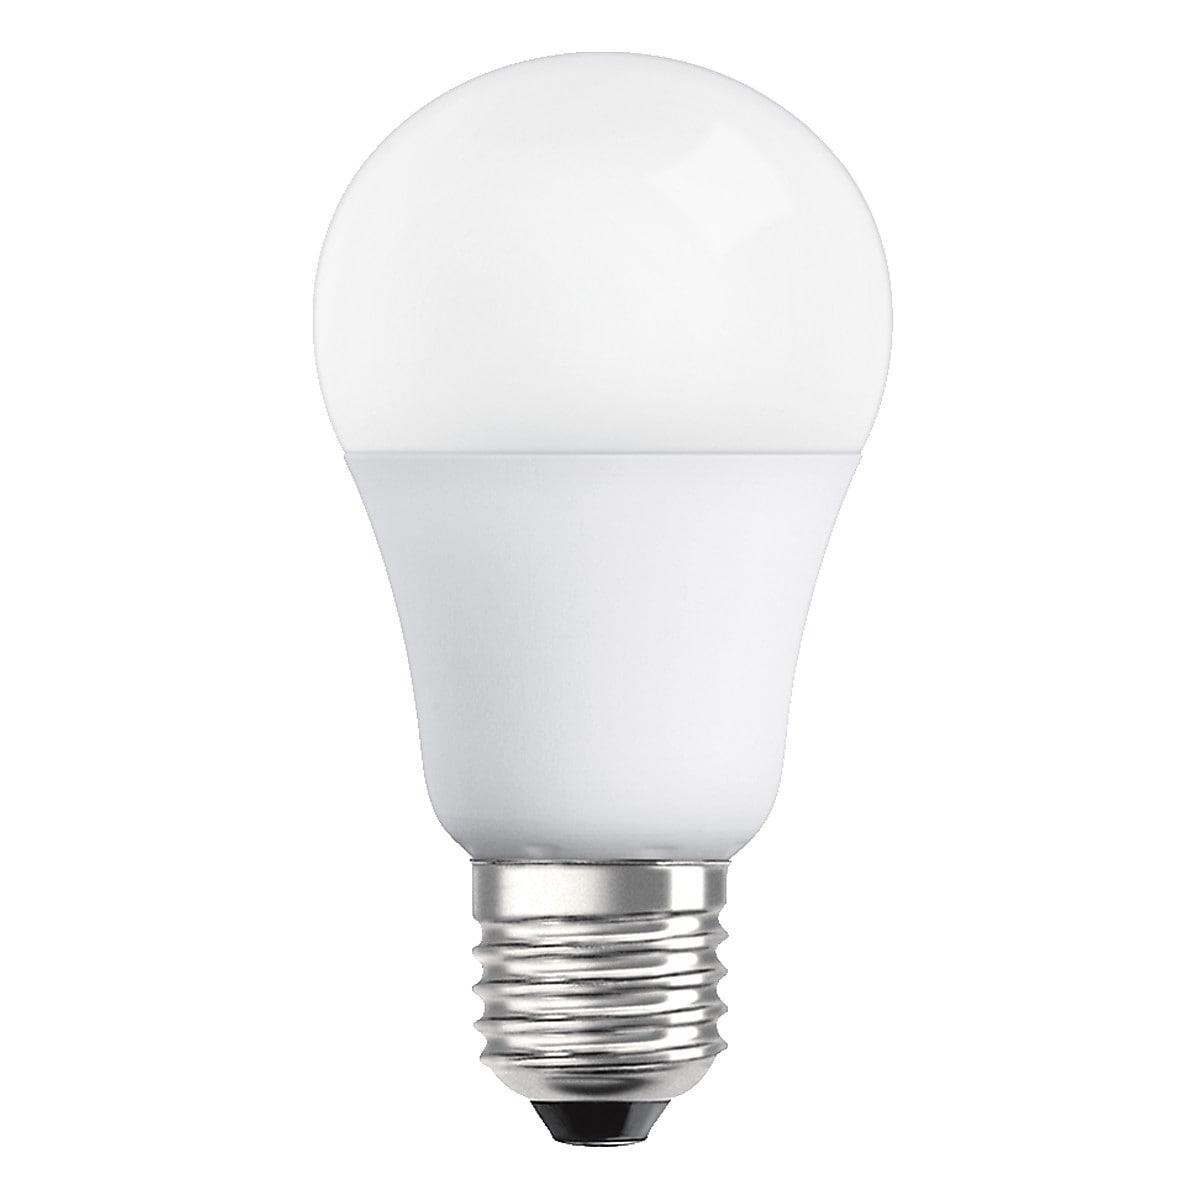 Osram E27 LED Superstar Classic Standard Shape Bulb